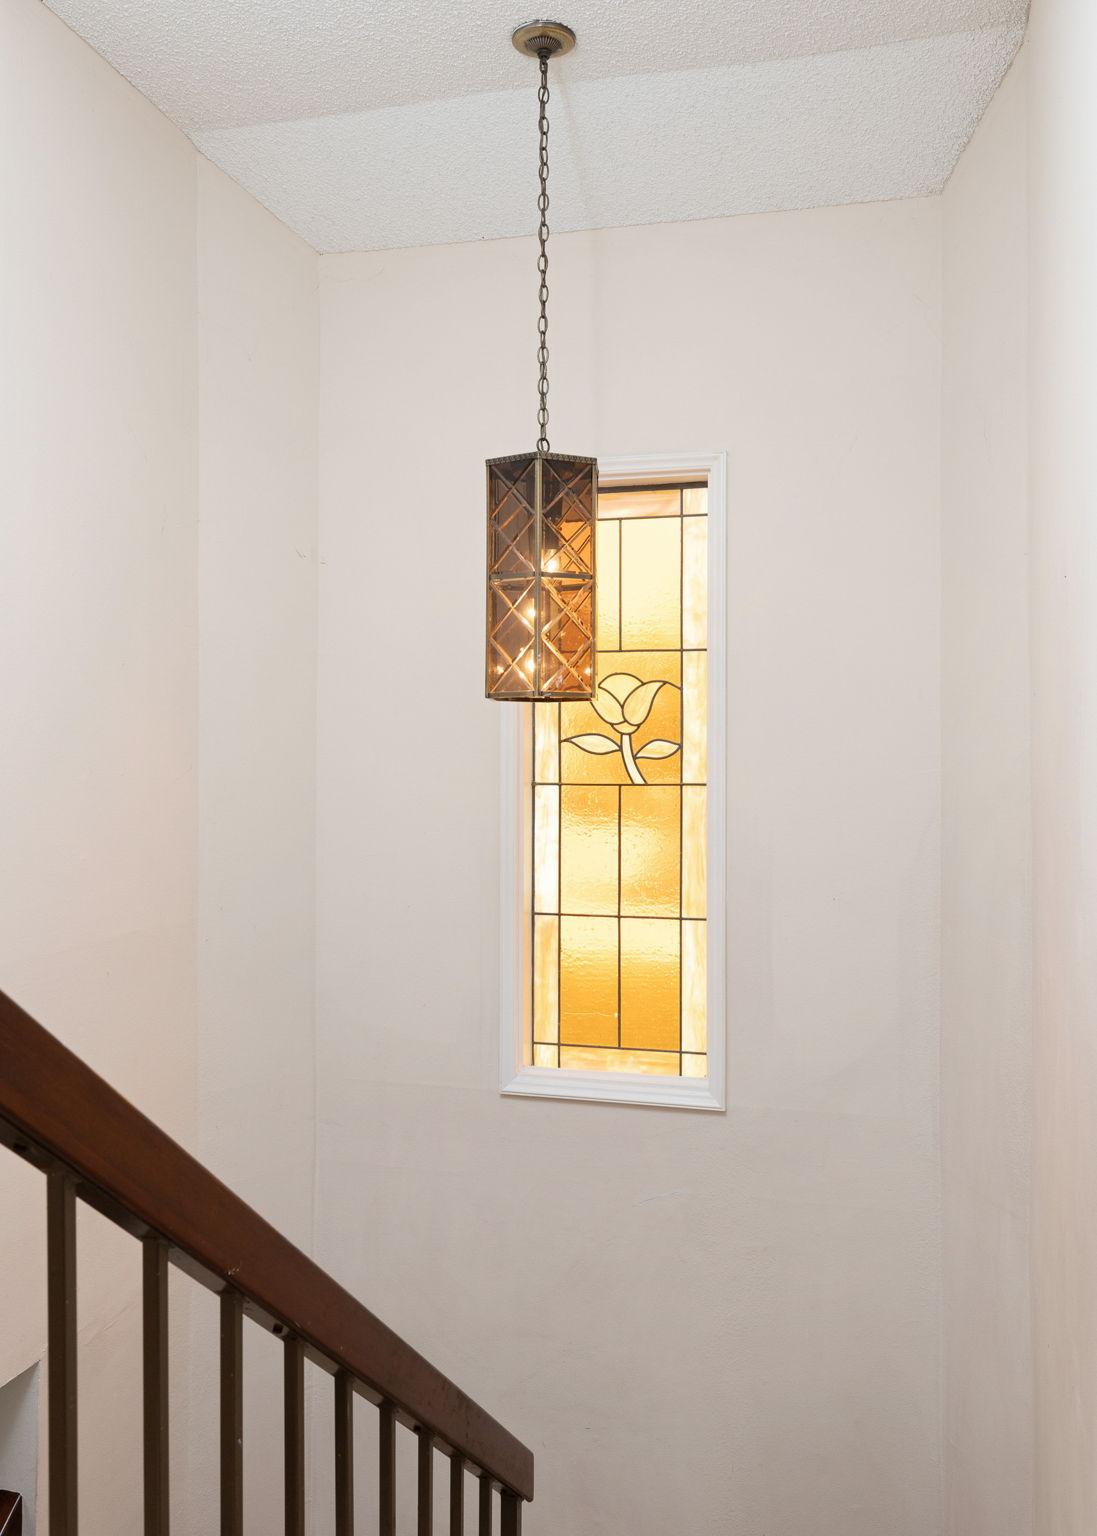 Decorator window in stairway